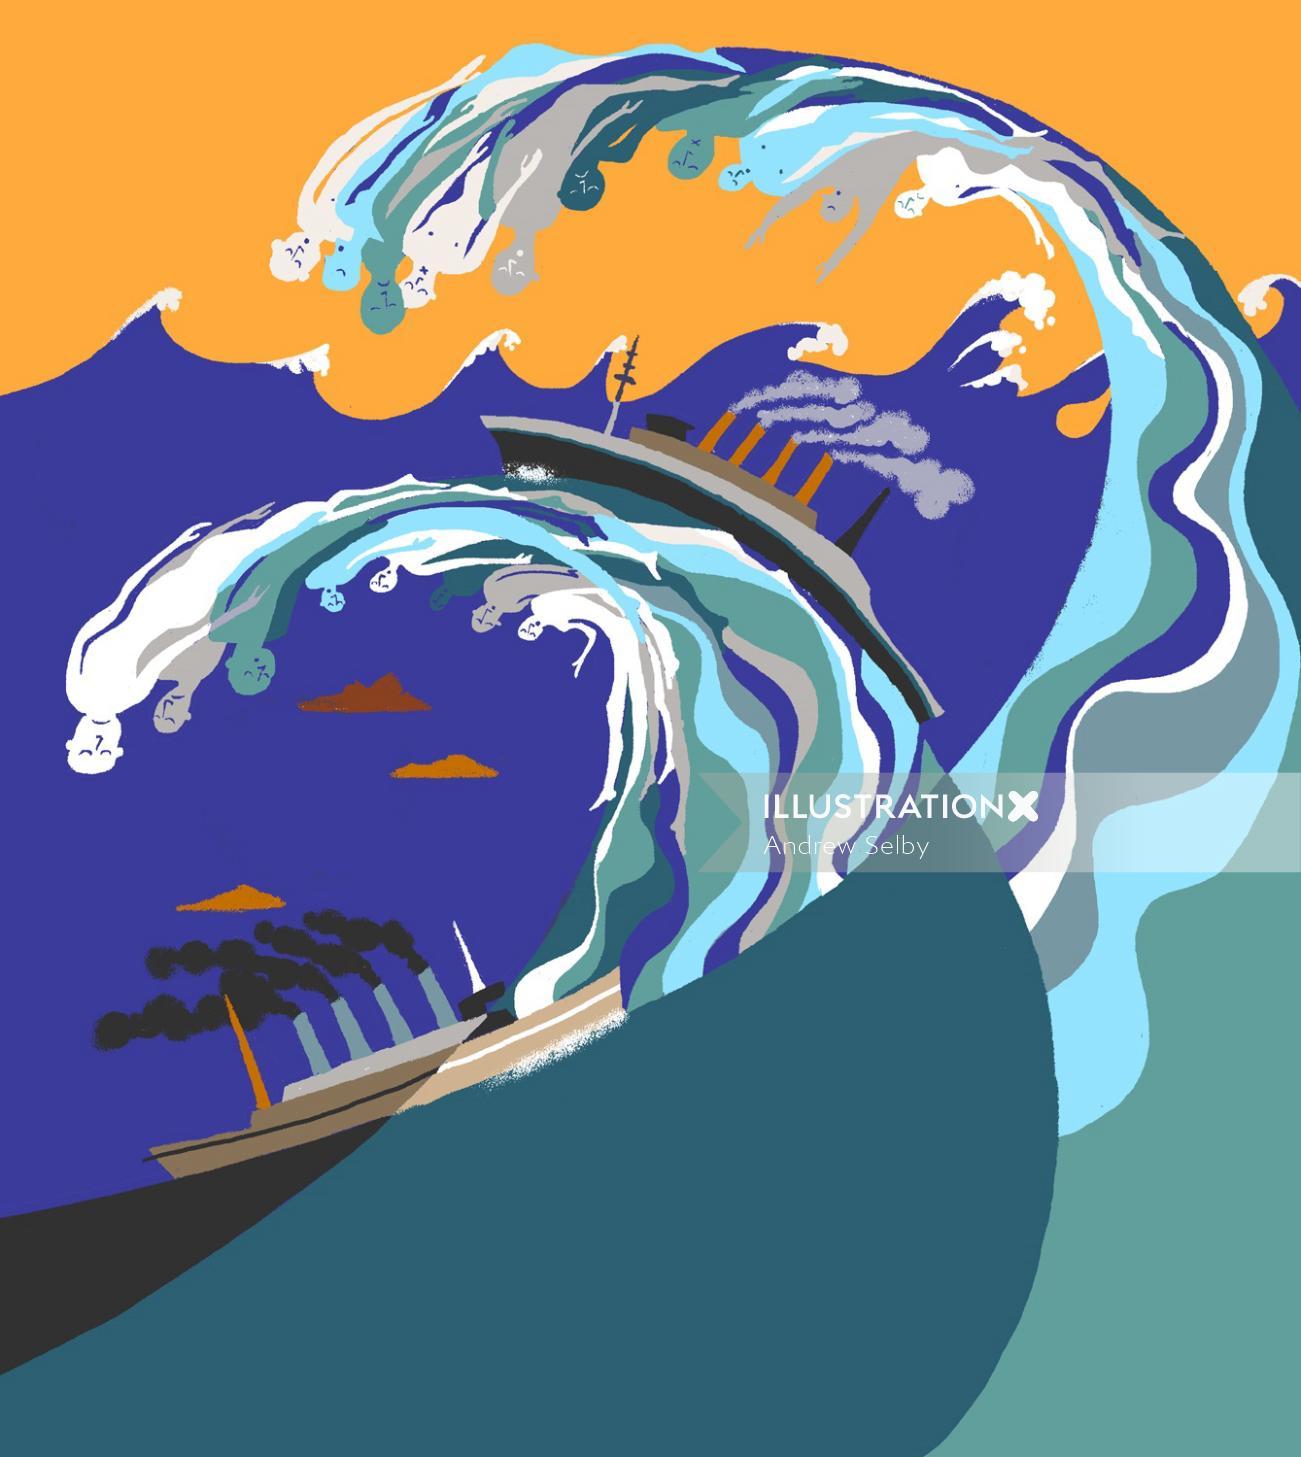 Ships stuck in big waves